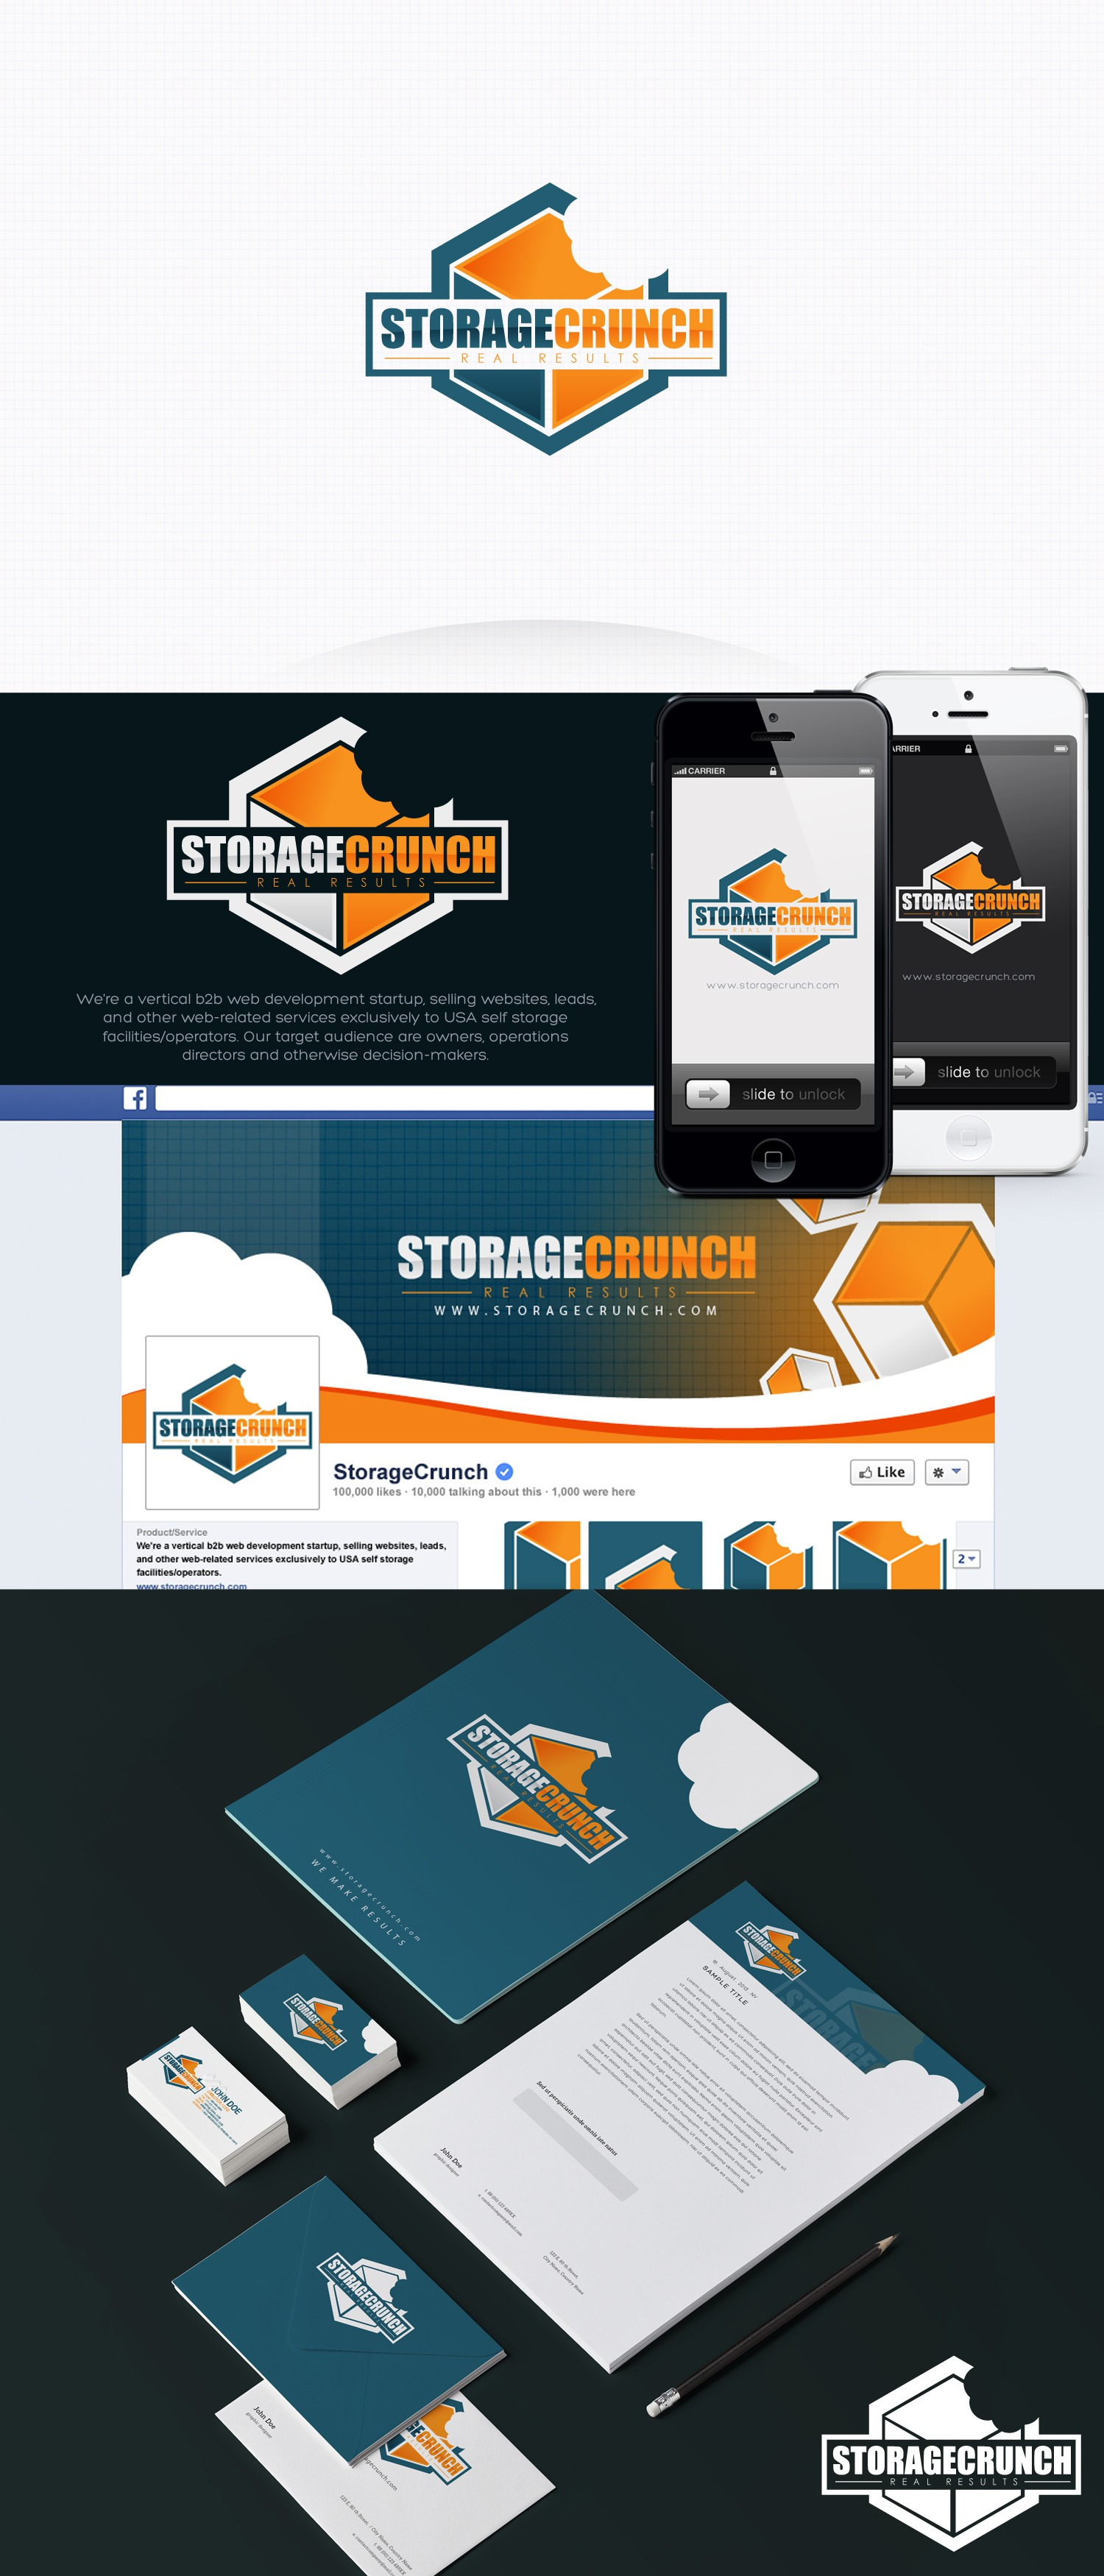 Create Logo/Brand Identity for new startup web development company - self storage vertical b2b.